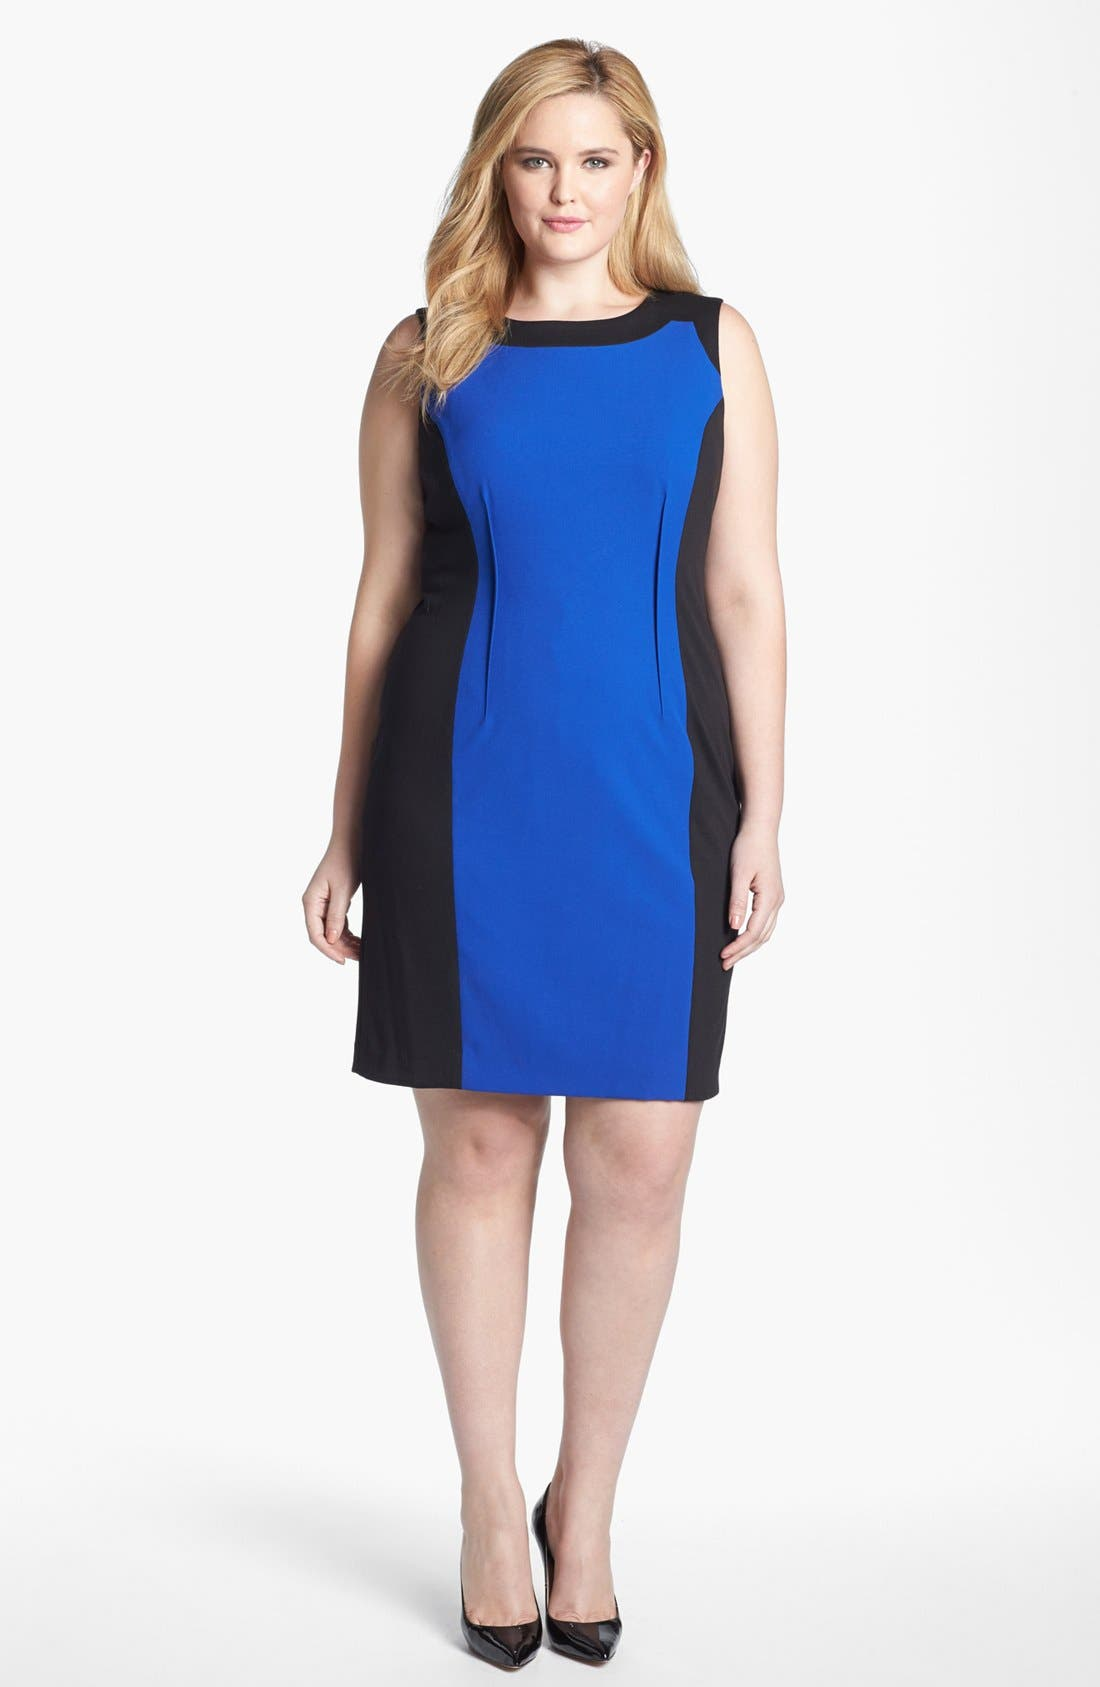 Alternate Image 1 Selected - Calvin Klein Sleeveless Colorblock Dress (Plus Size)